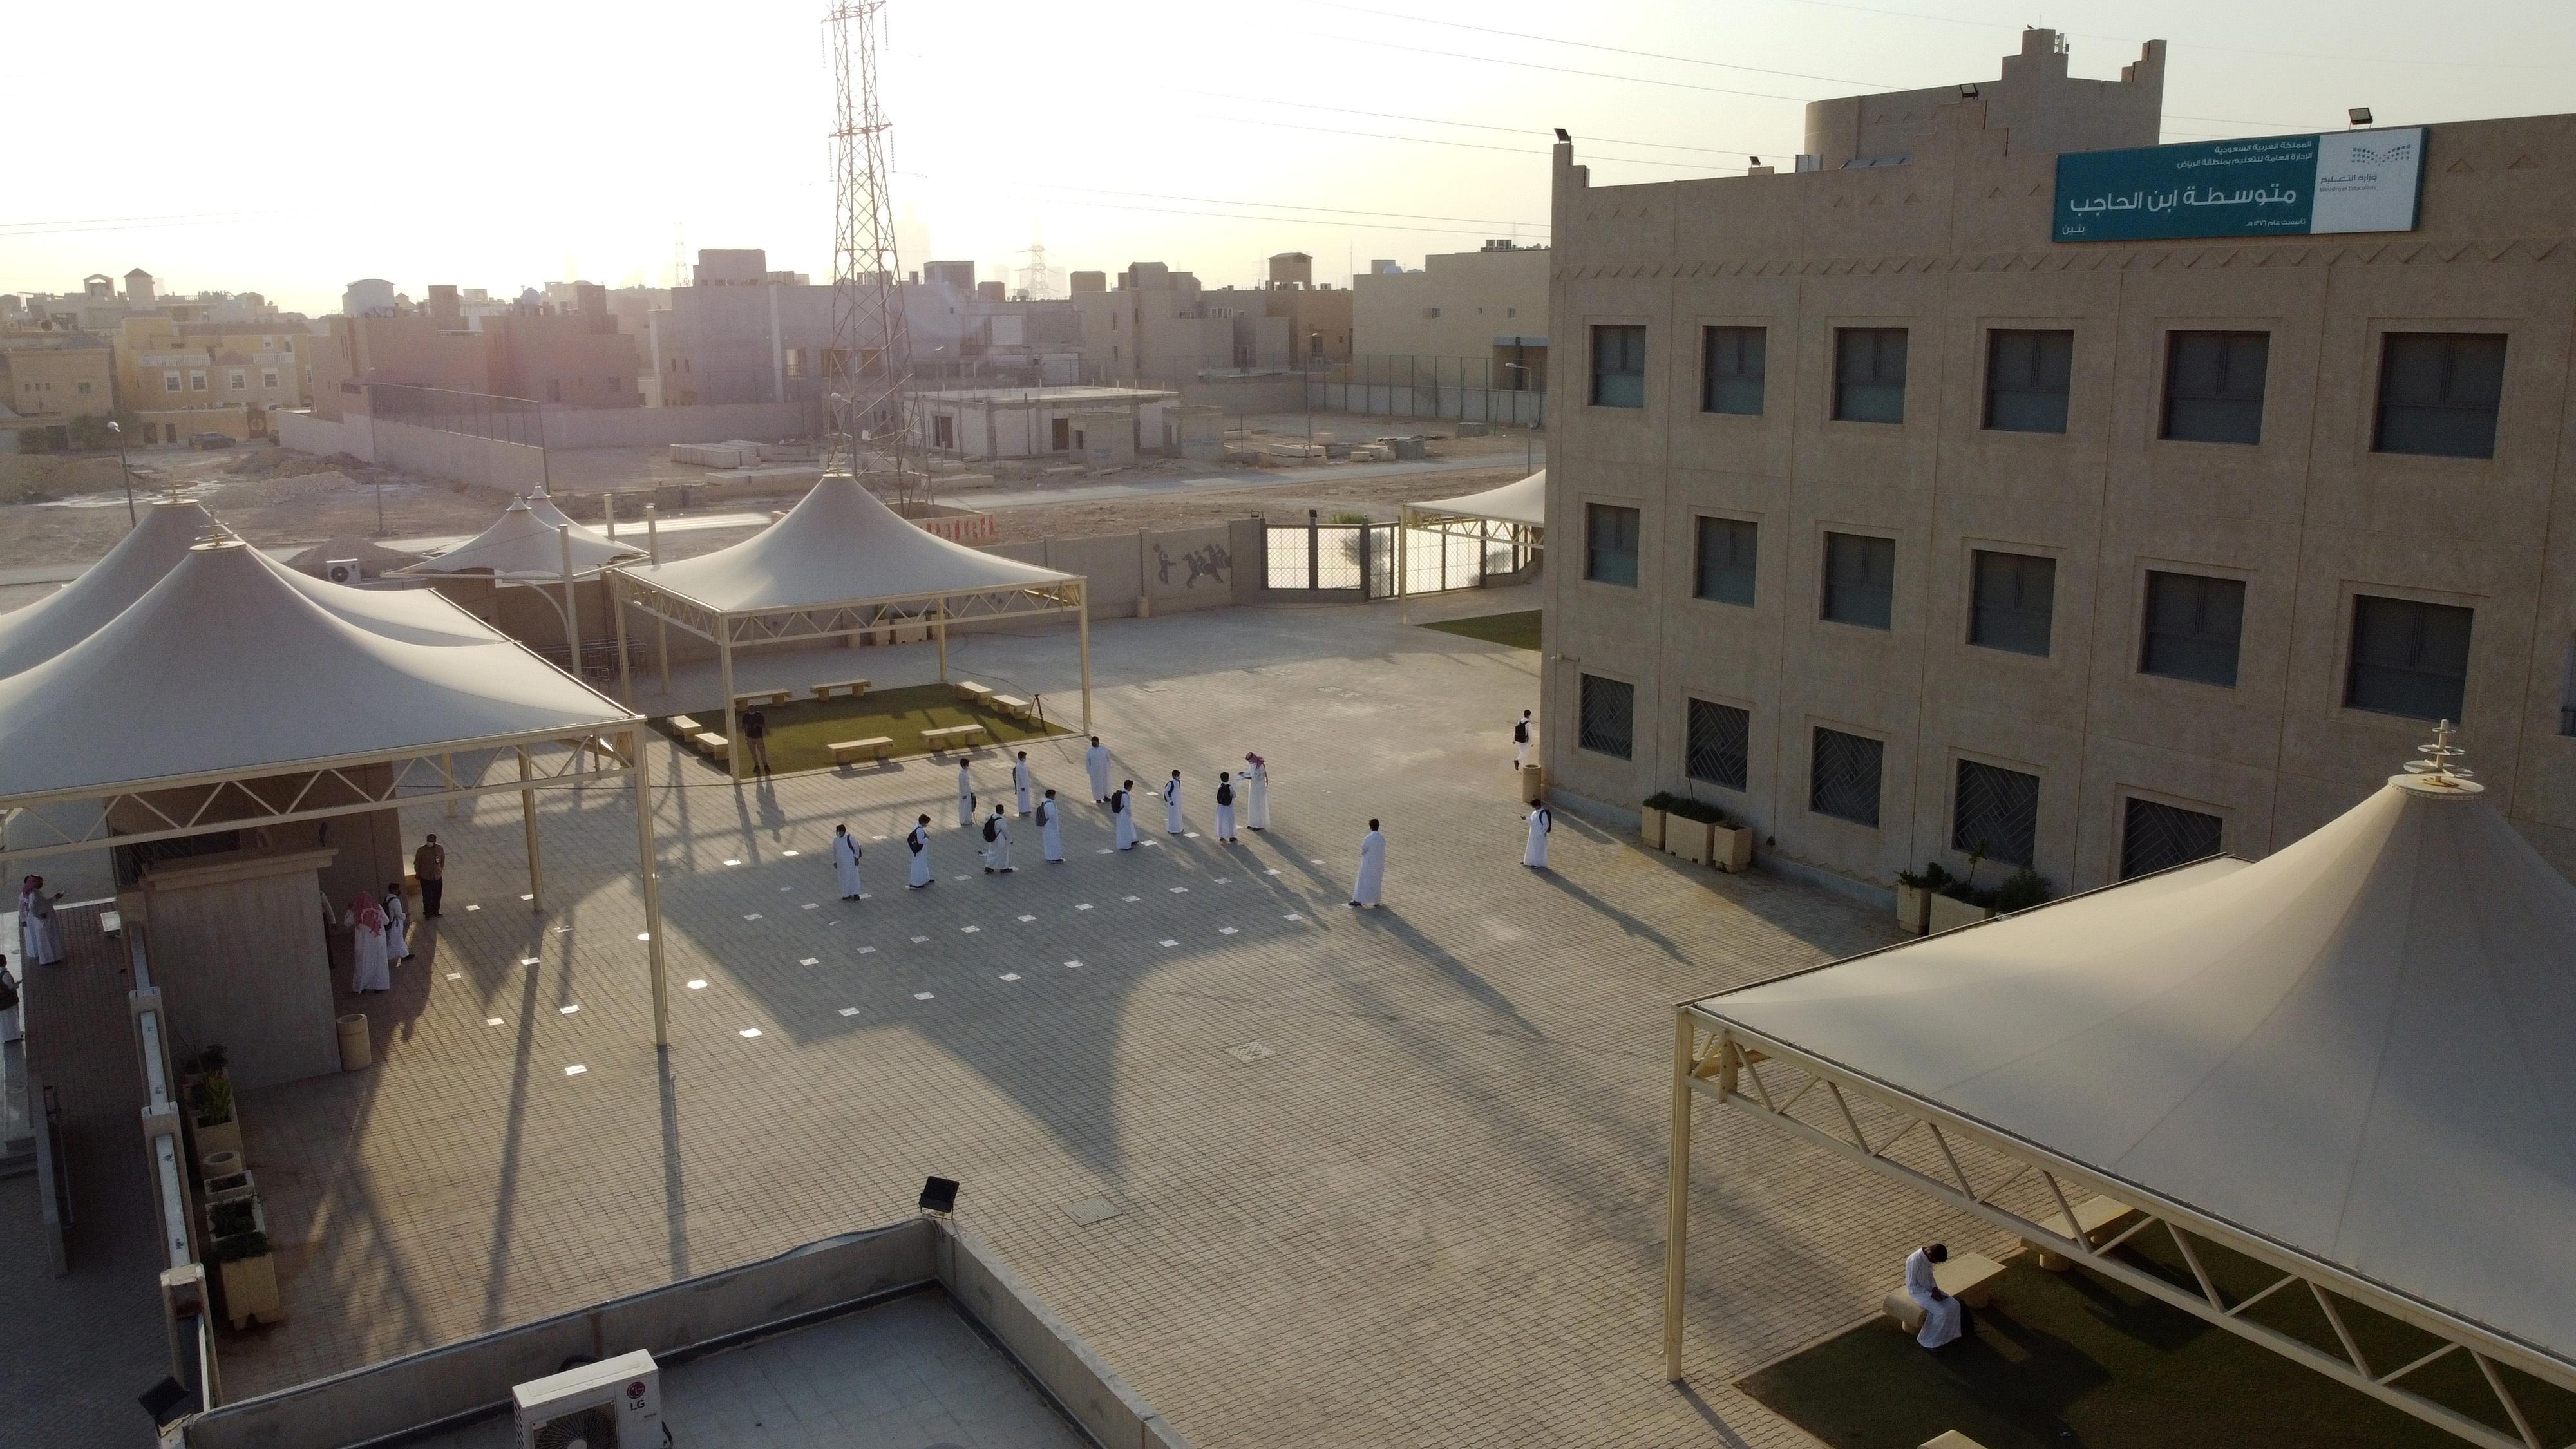 6 million students return to school in the Kingdom of Saudi Arabi